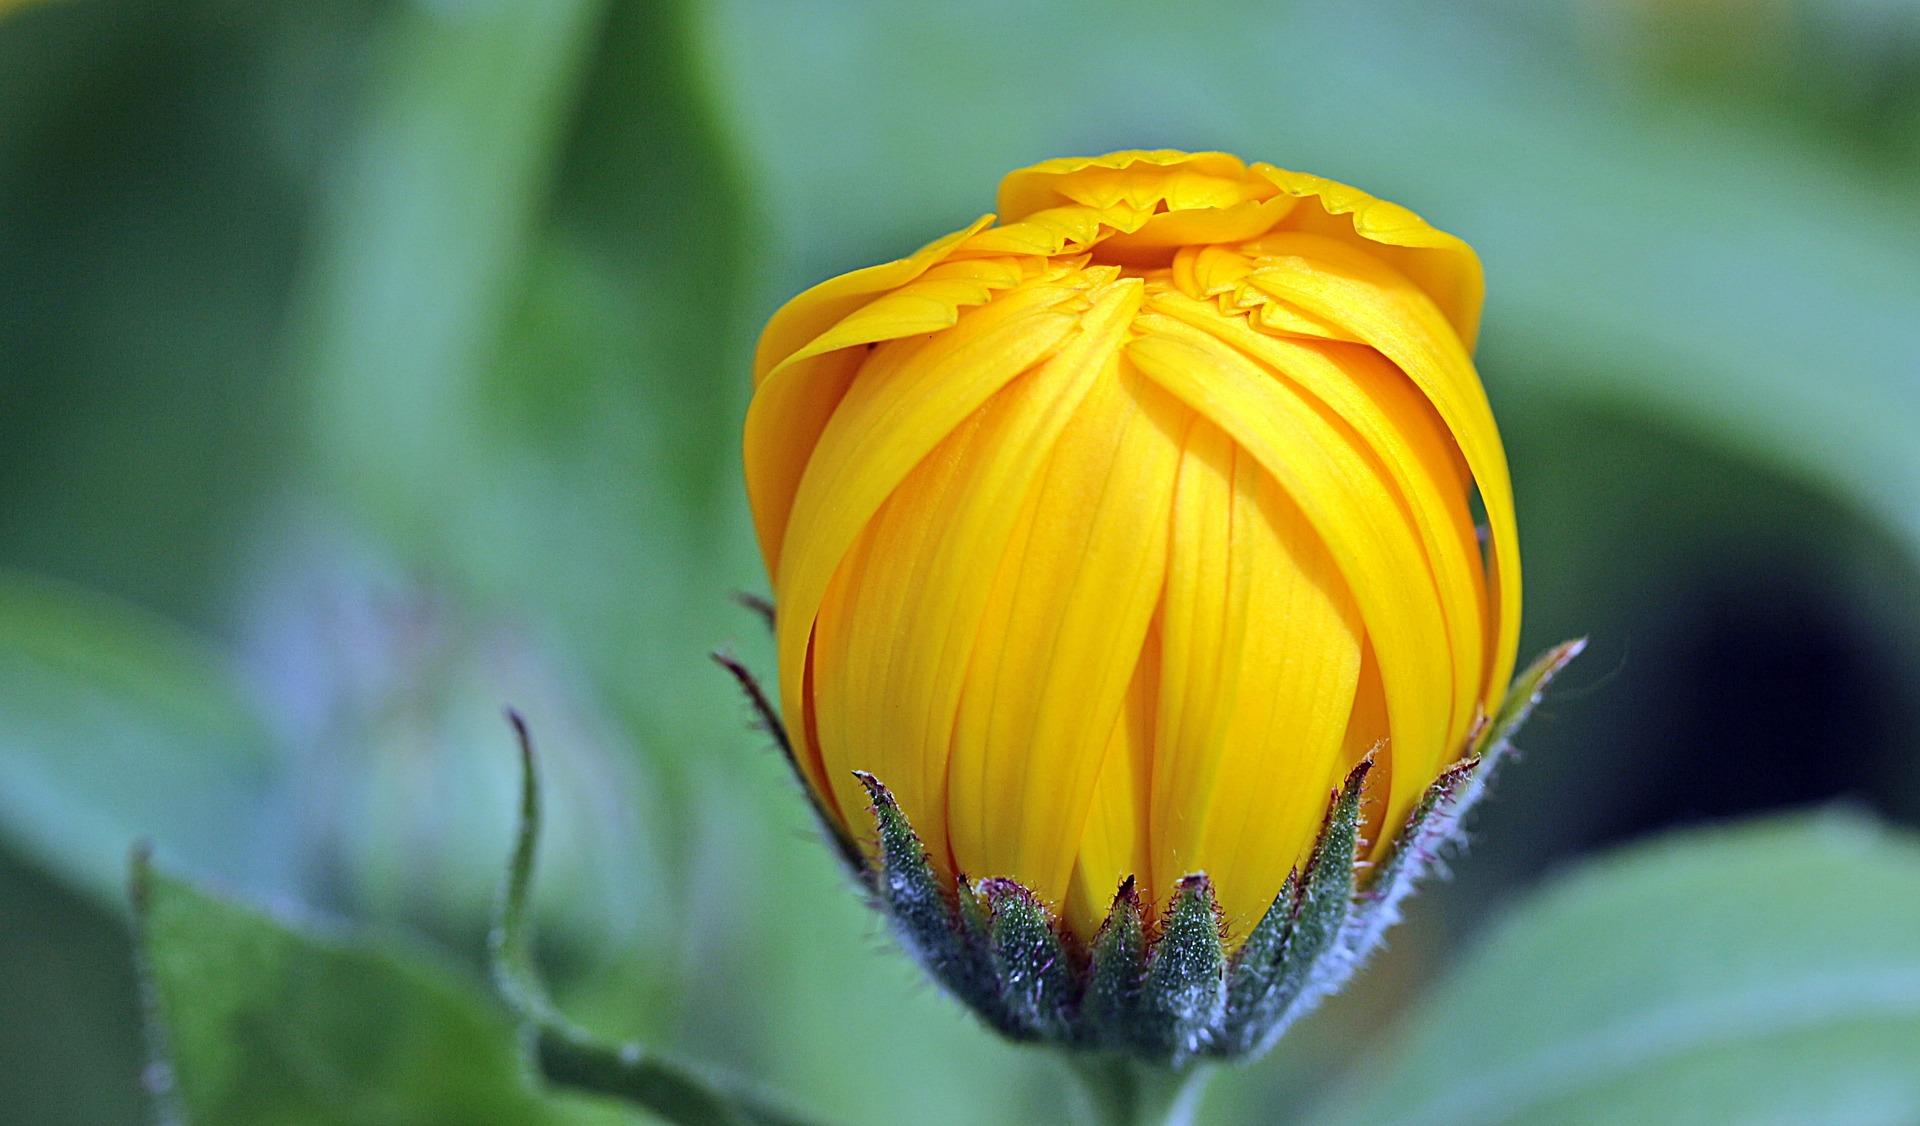 marigold-1503876_1920.jpg